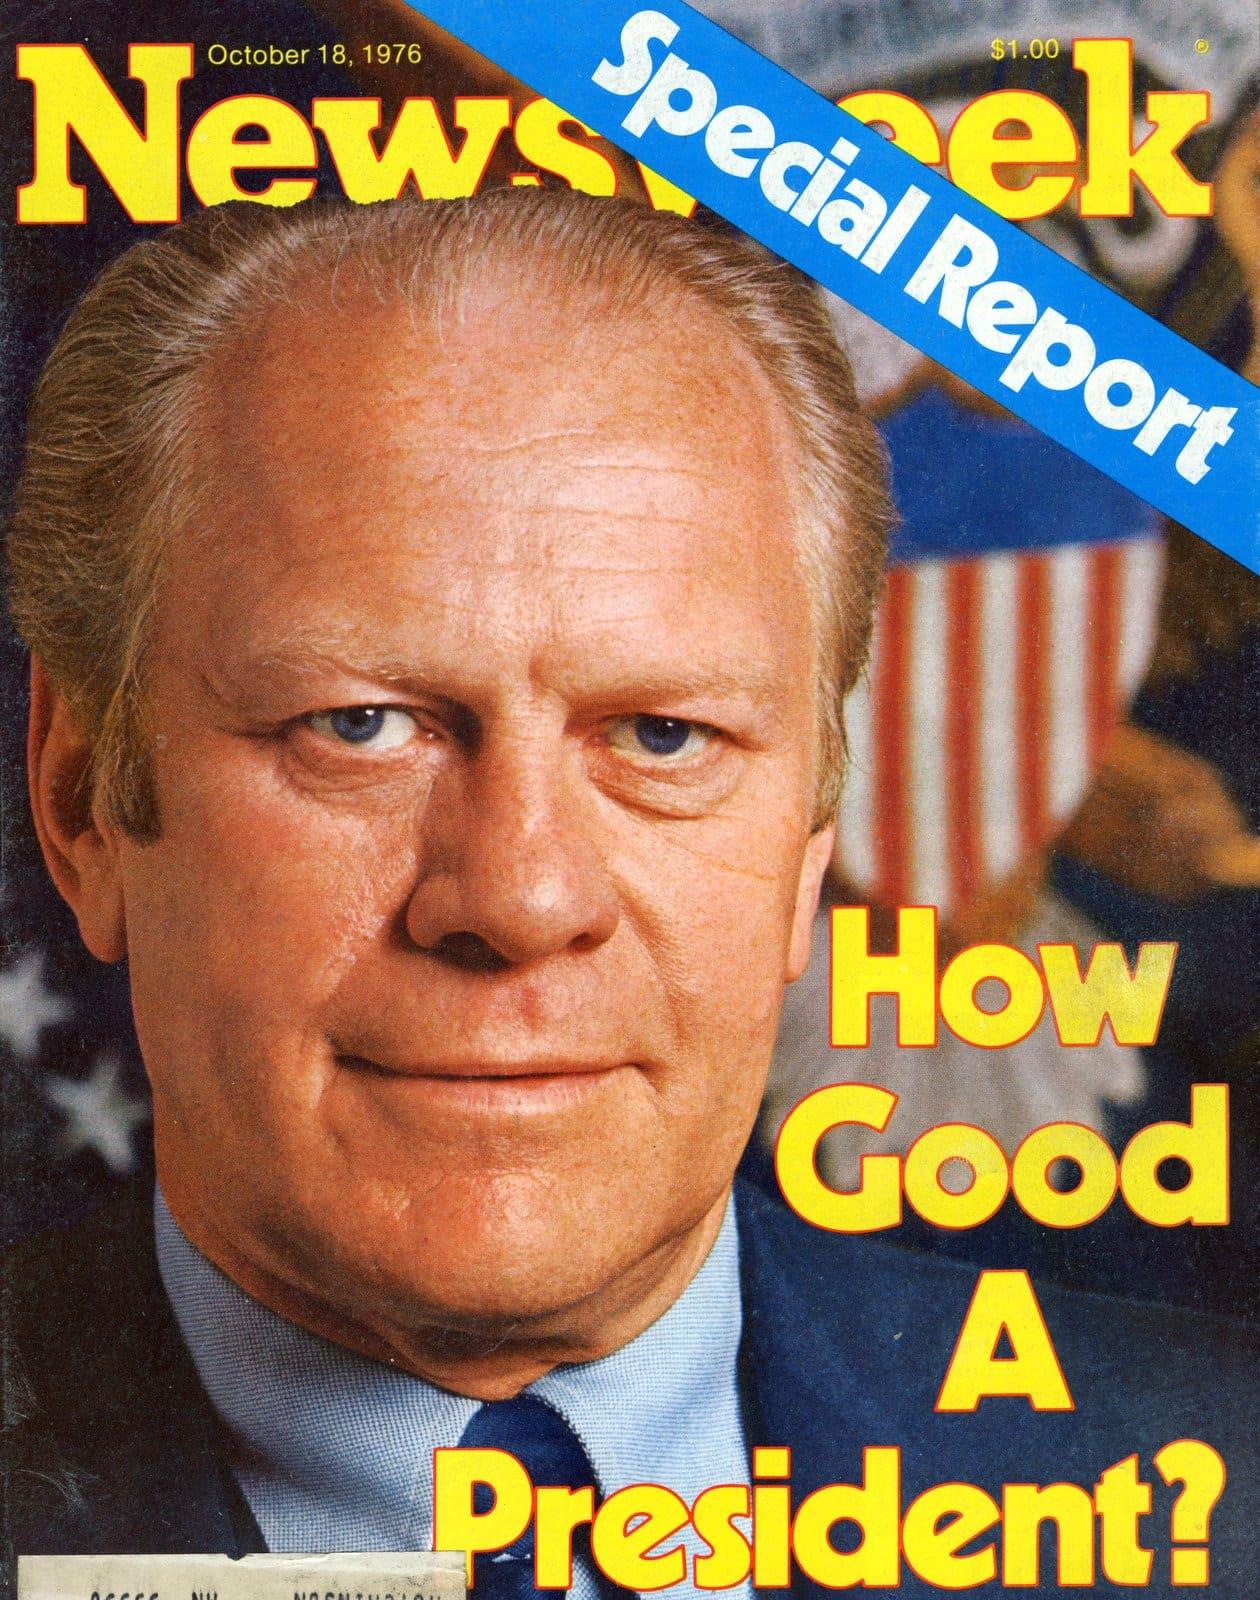 Newsweek - October 18 1976 - President Ford